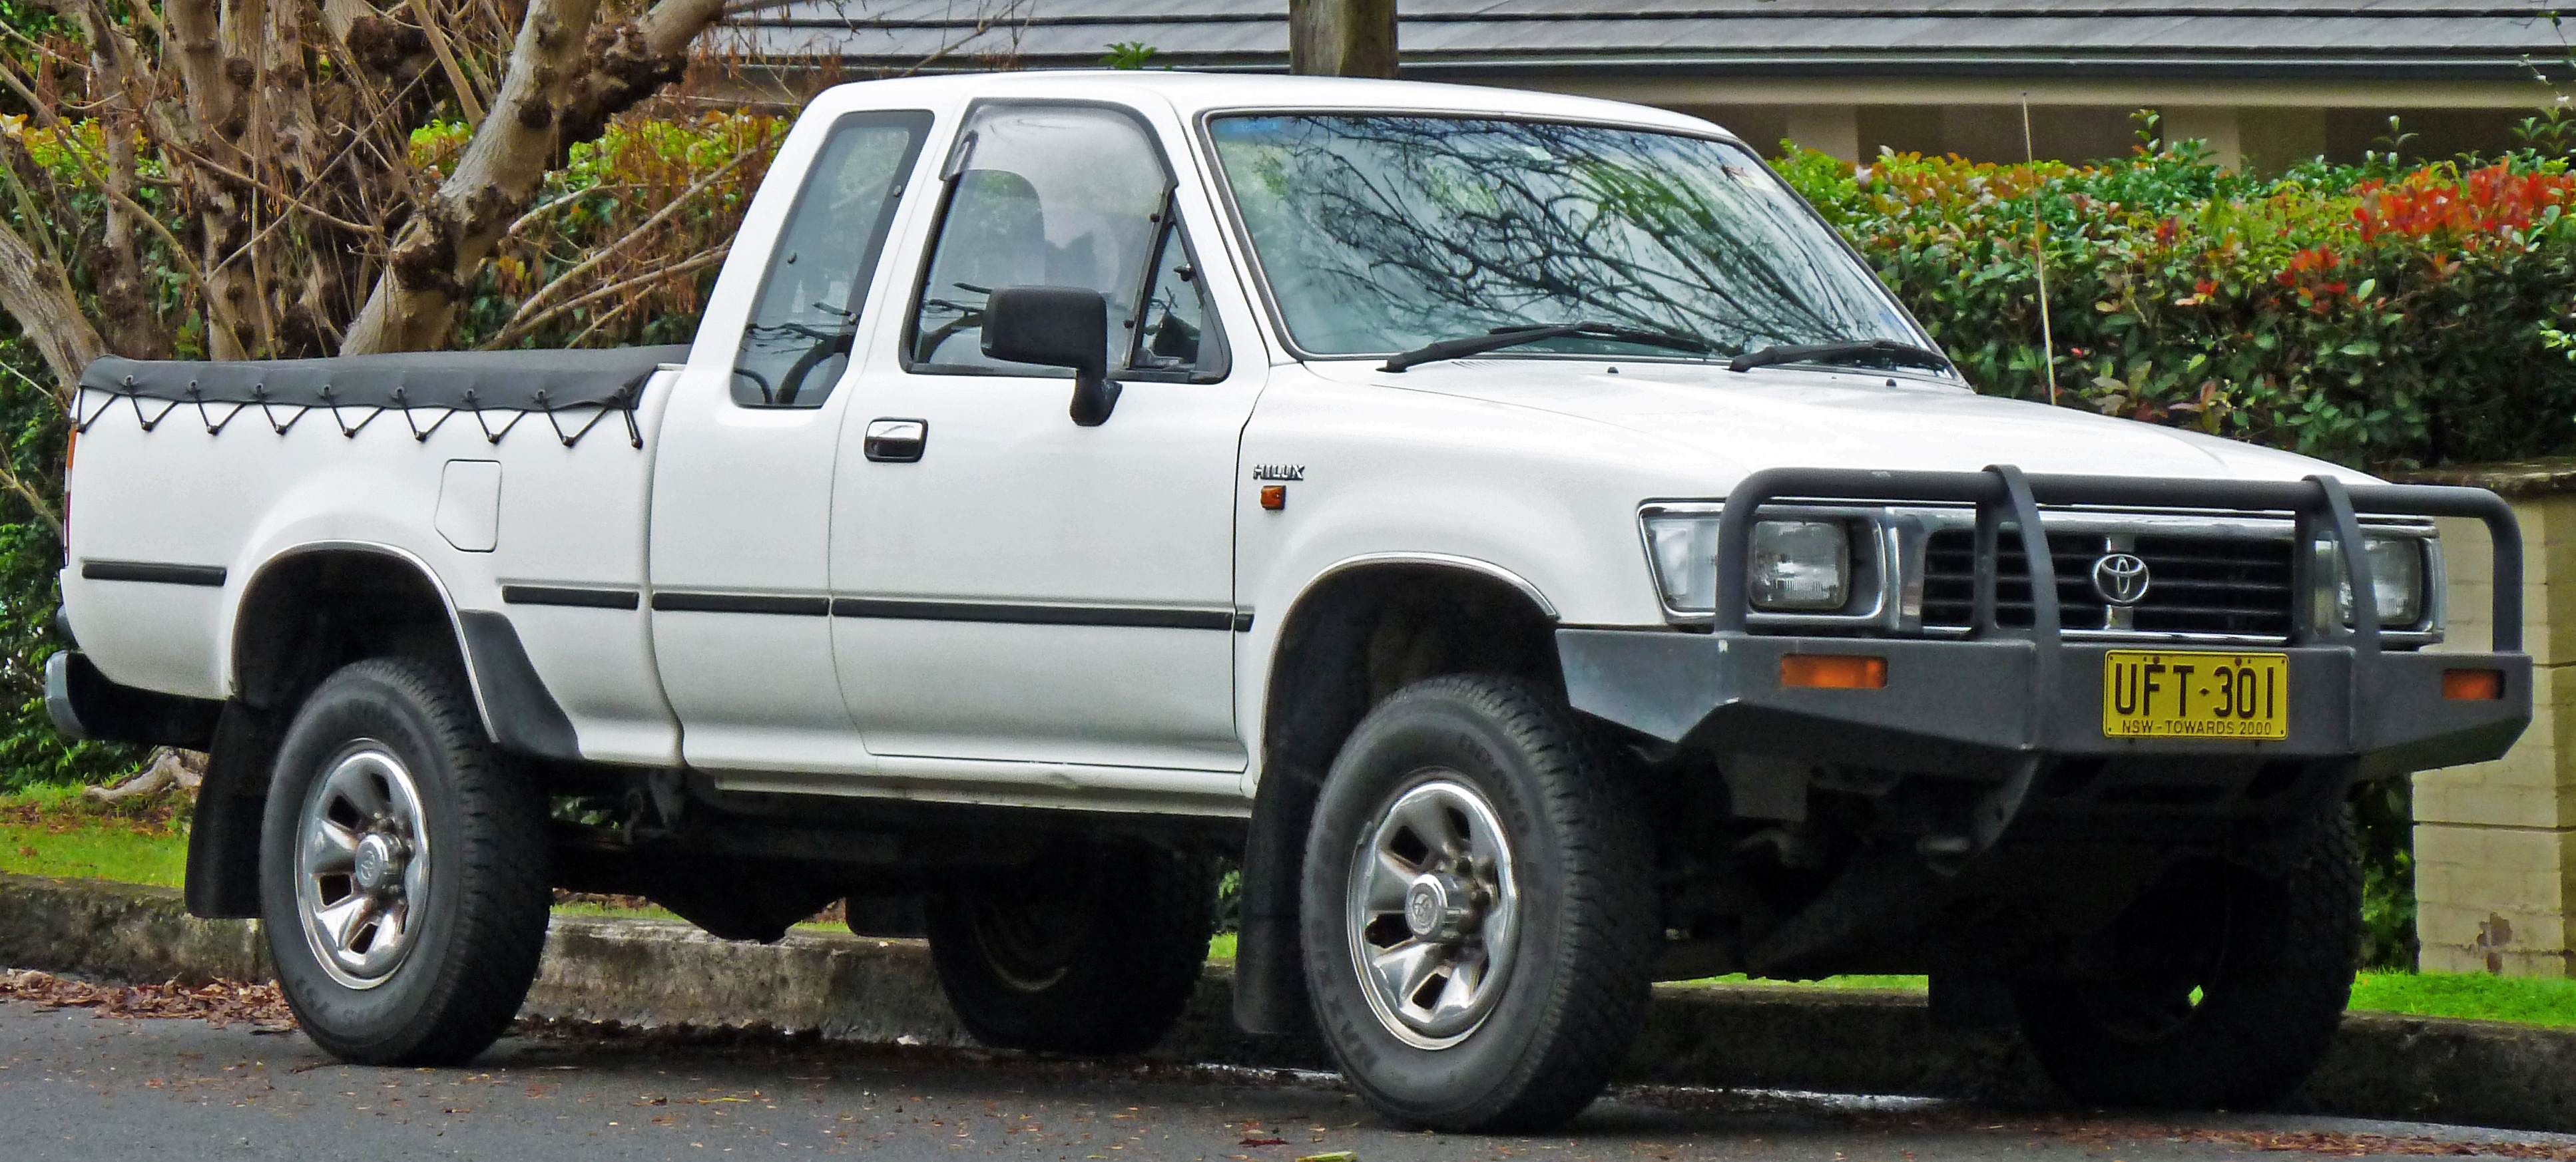 Ford Ranger 2016 Double Cab >> File:1994-1997 Toyota Hilux (RN110R) SR5 Xtra Cab 2-door utility (2011-06-15) 01.jpg - Wikimedia ...